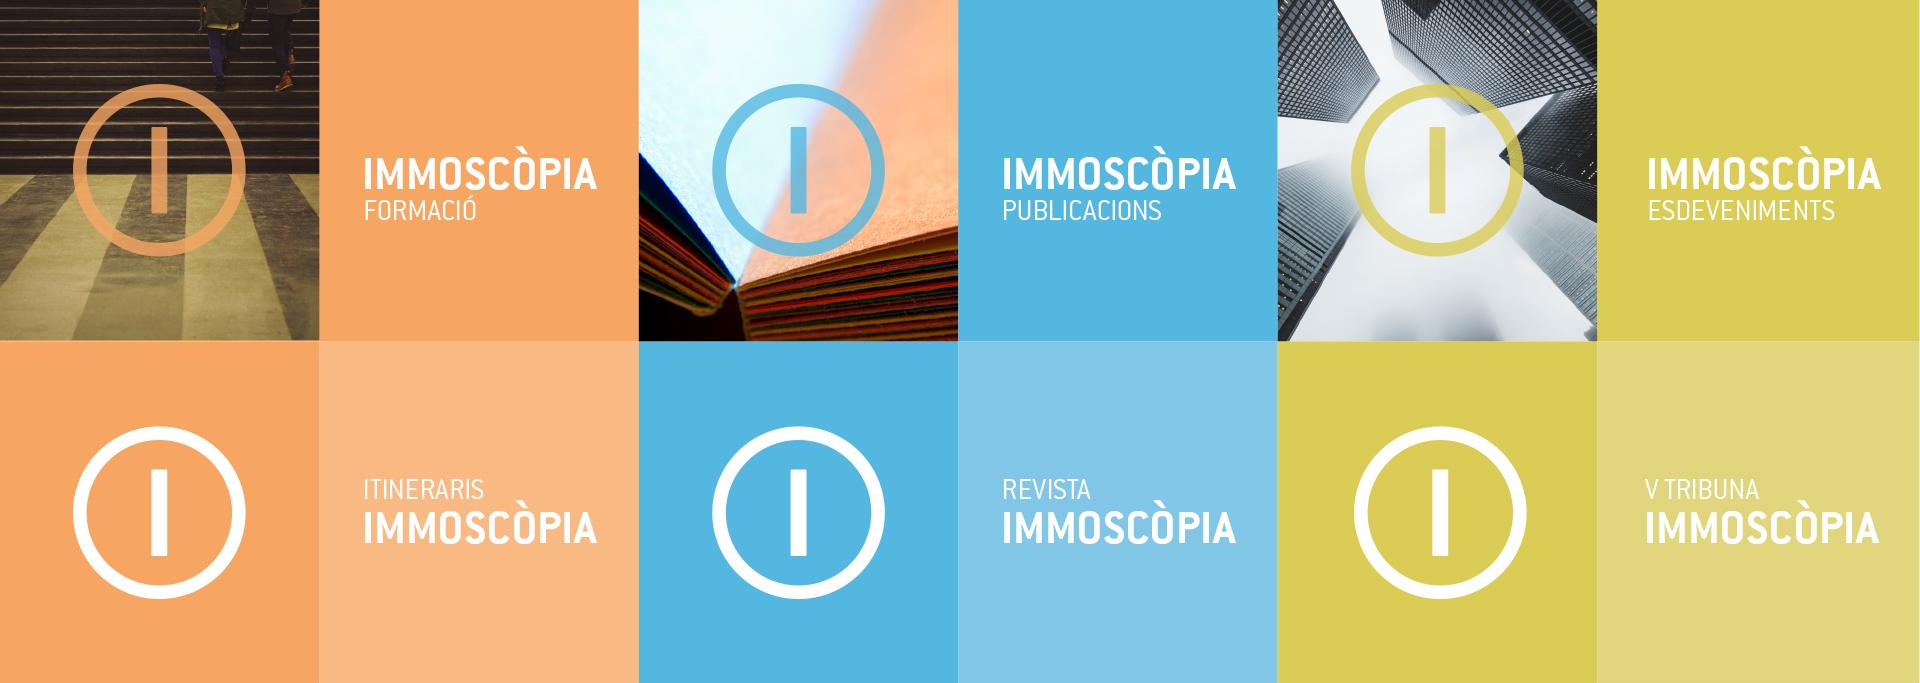 identidad-immoscopia-01